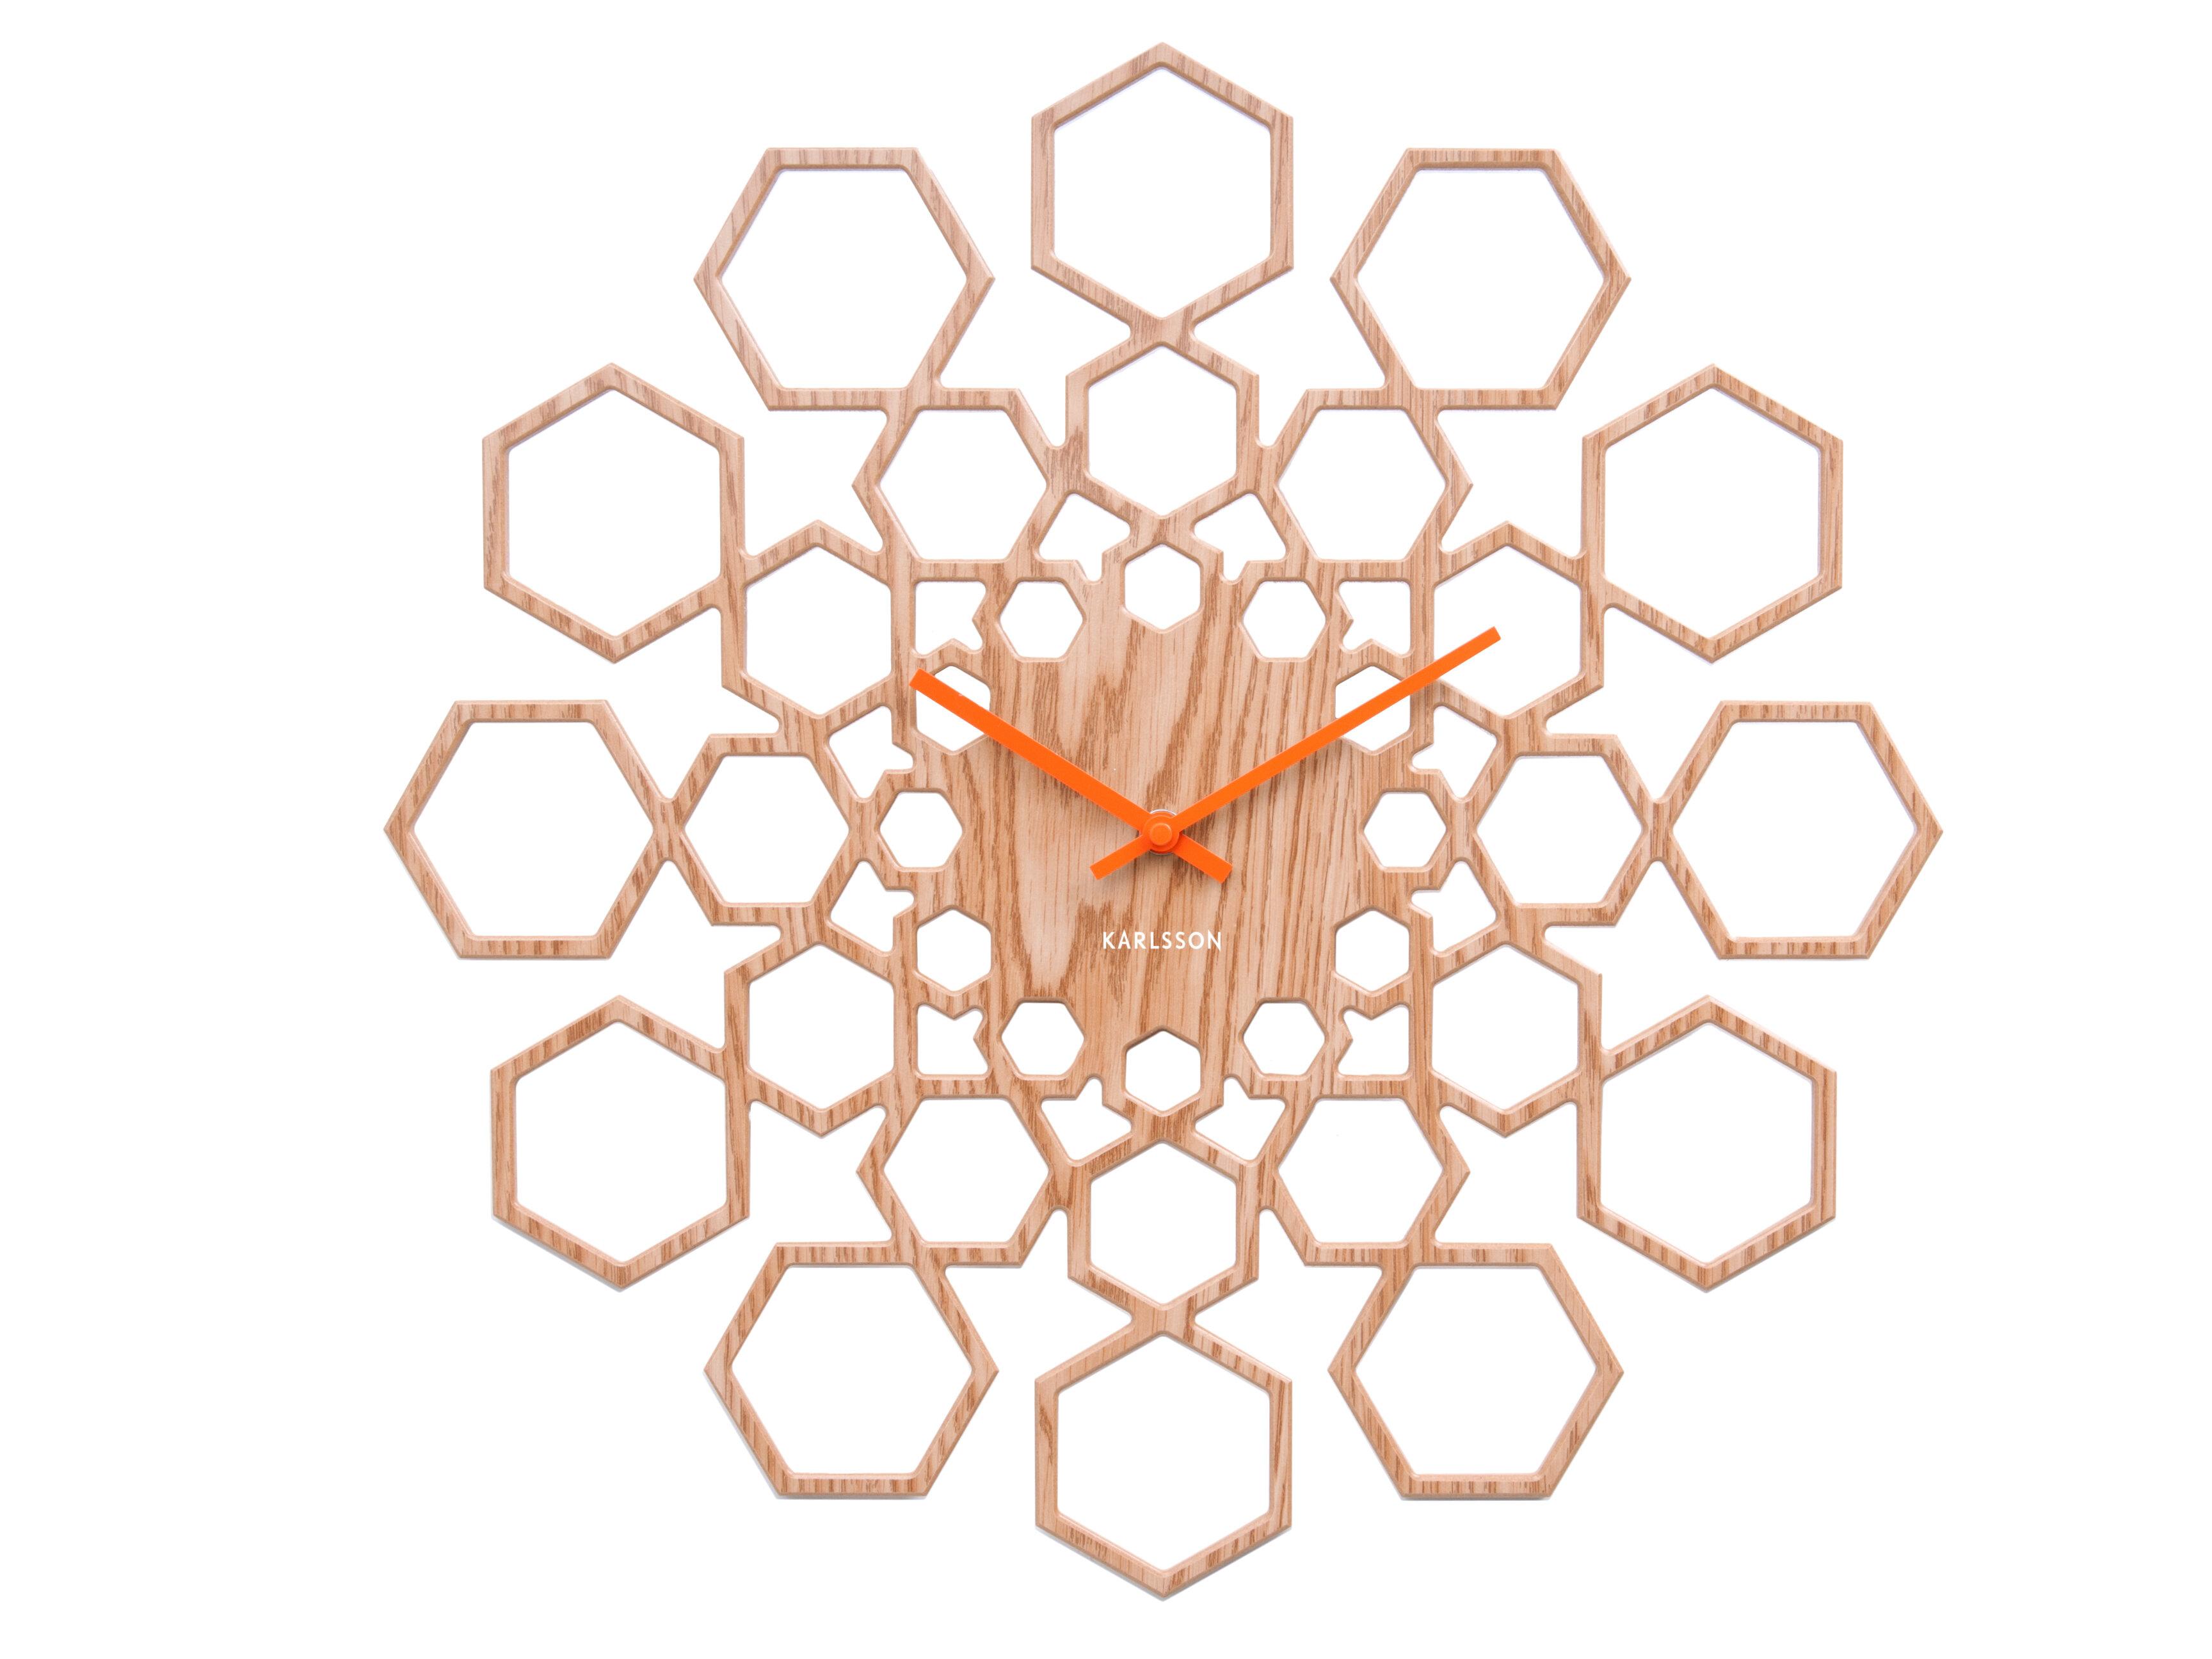 Karlsson Design Wall Clocks KA5639WD